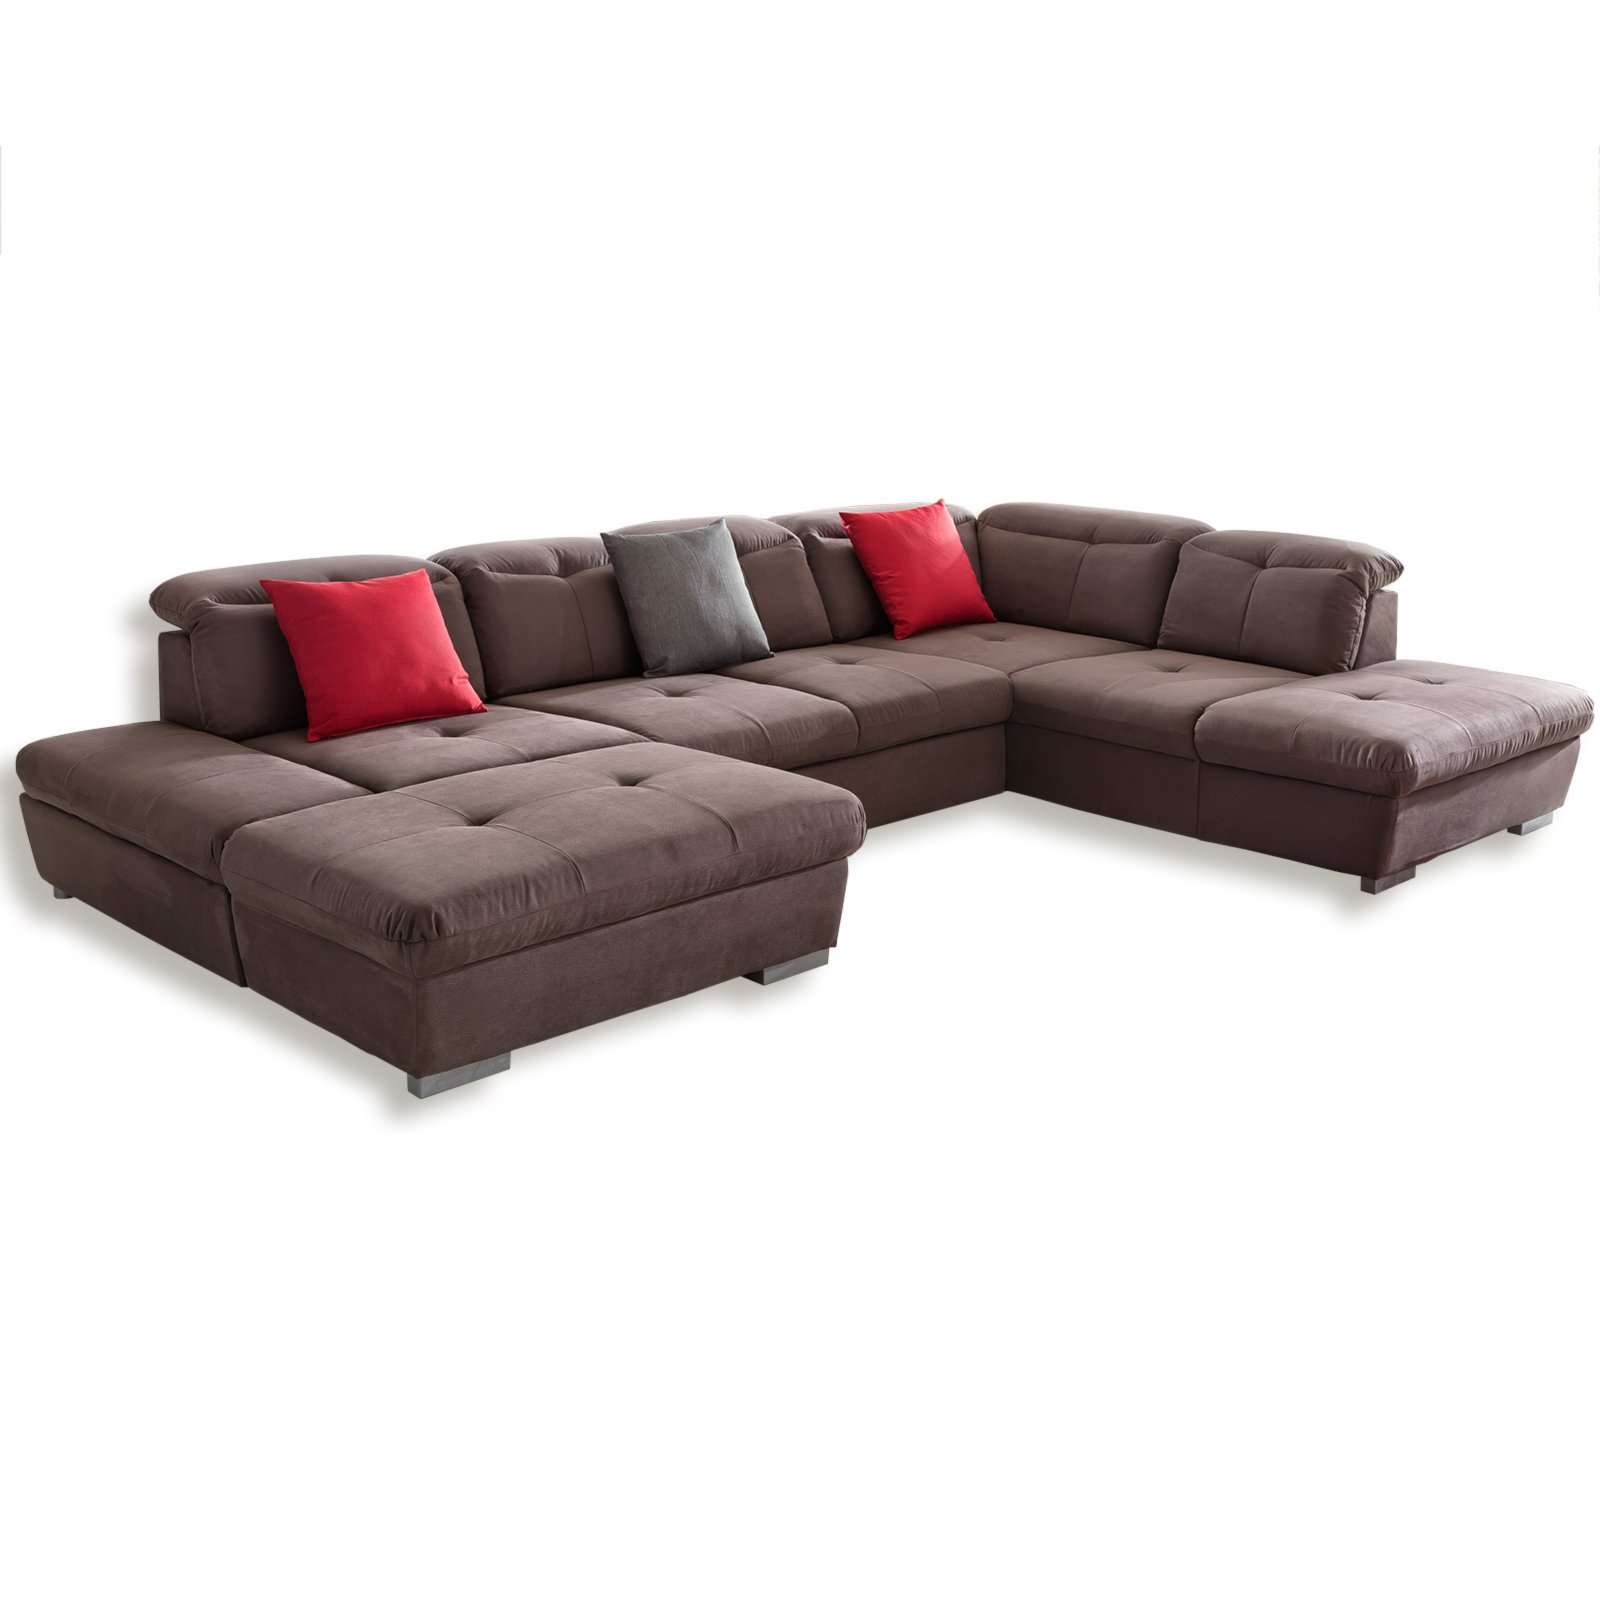 wohnlandschaft braun ottomane rechts. Black Bedroom Furniture Sets. Home Design Ideas